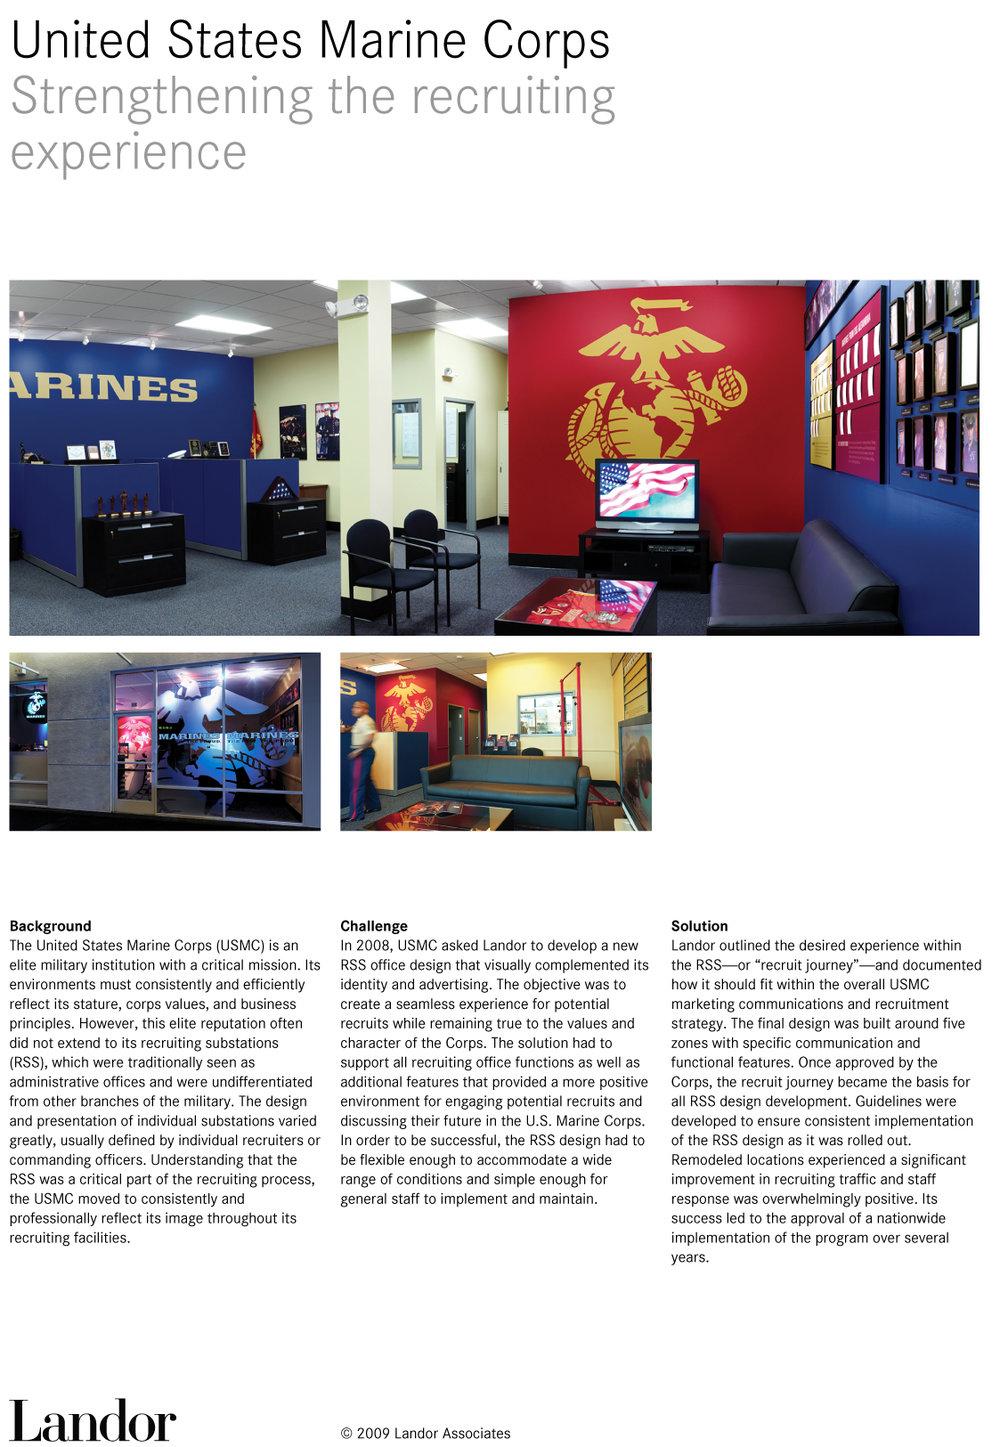 USMC RECRUITING CENTER BRANDING DESIGN ARTICLE